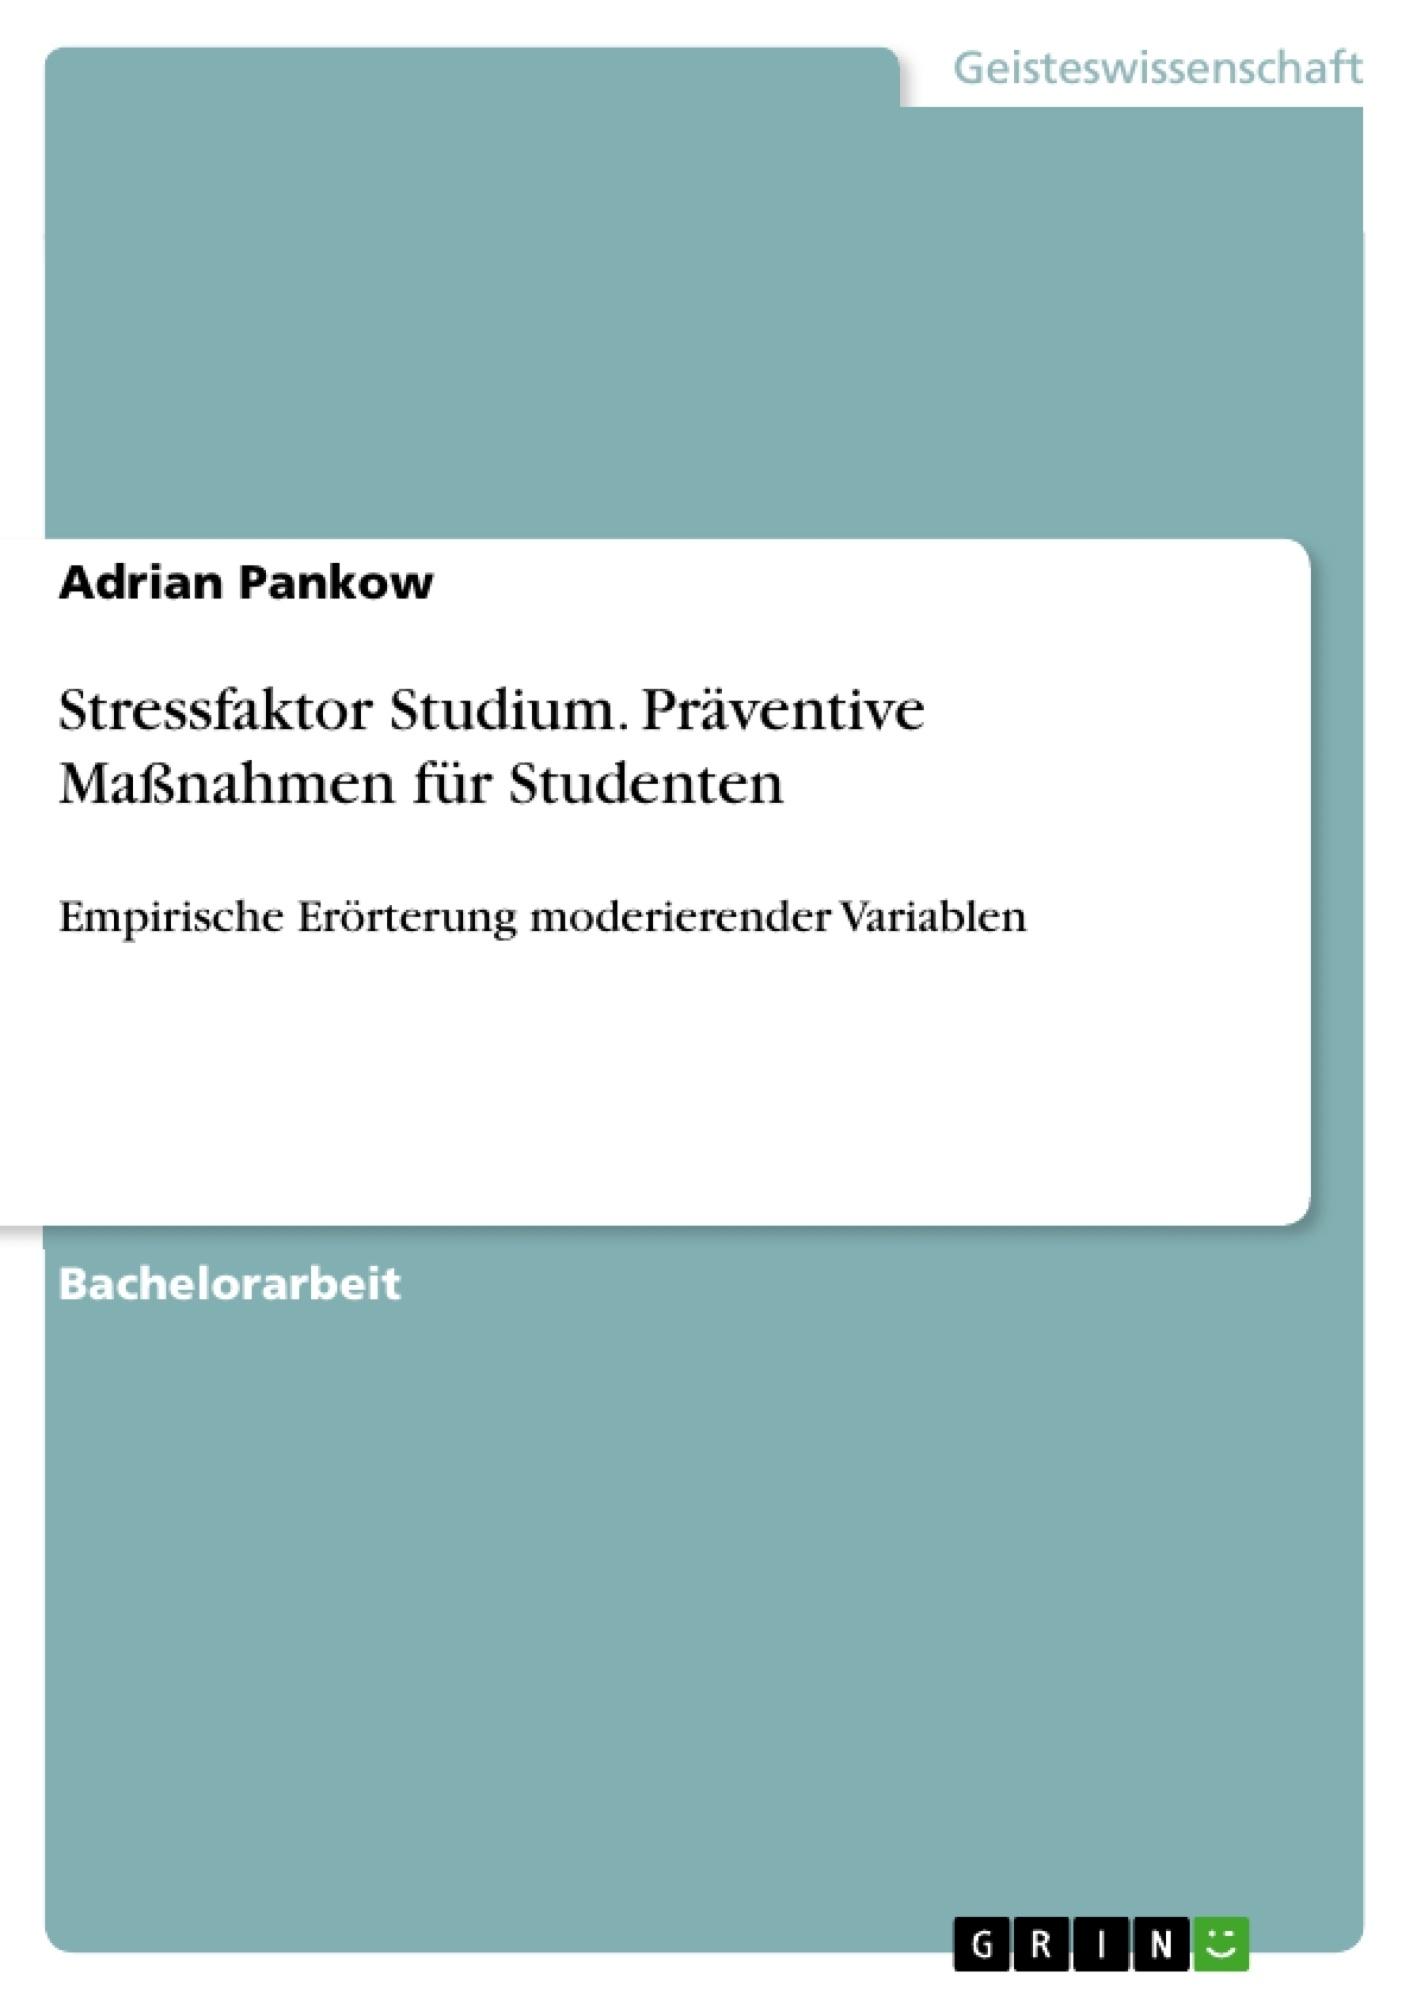 Titel: Stressfaktor Studium. Präventive Maßnahmen für Studenten